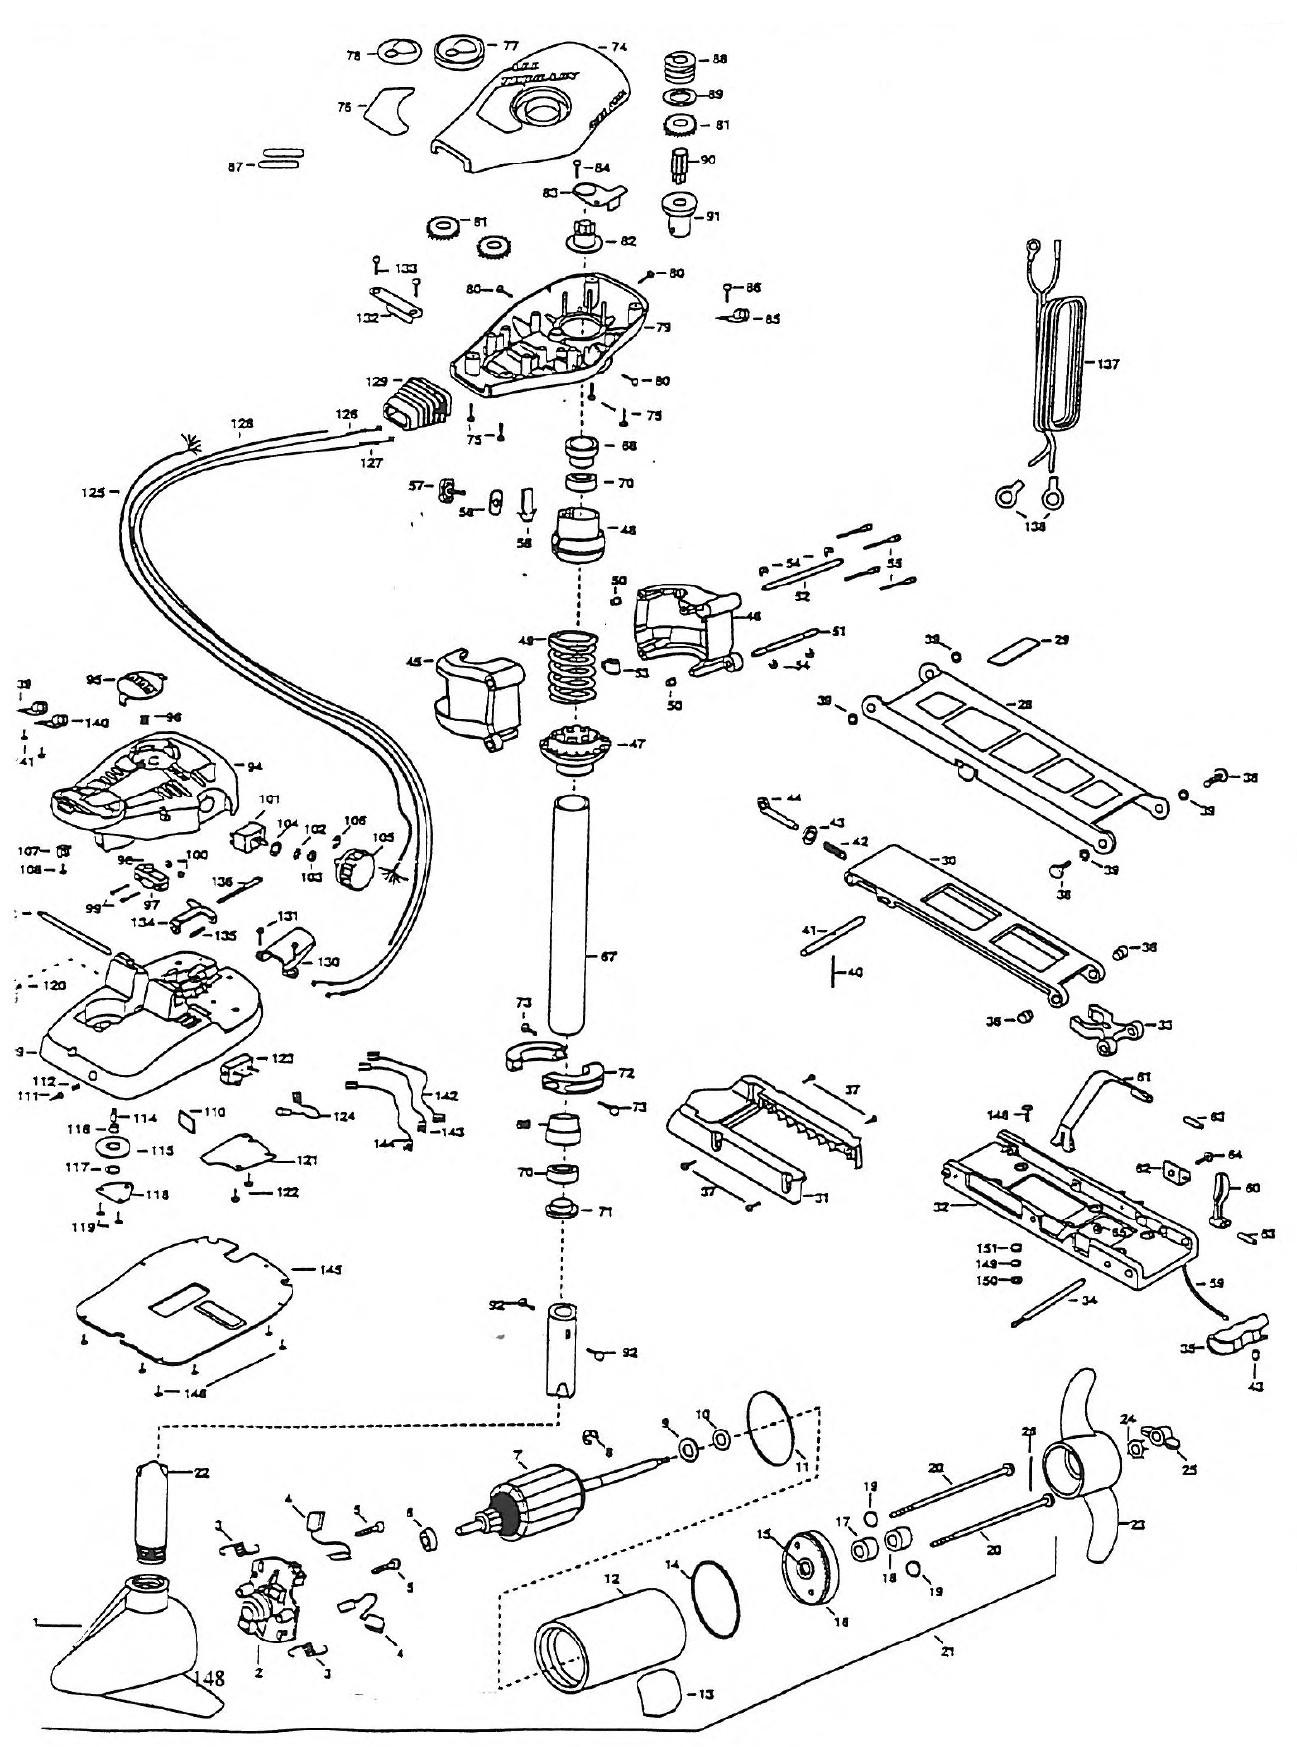 Minn Kota Terrova With Lift Assist Parts Diagram Diy Wiring Diagrams